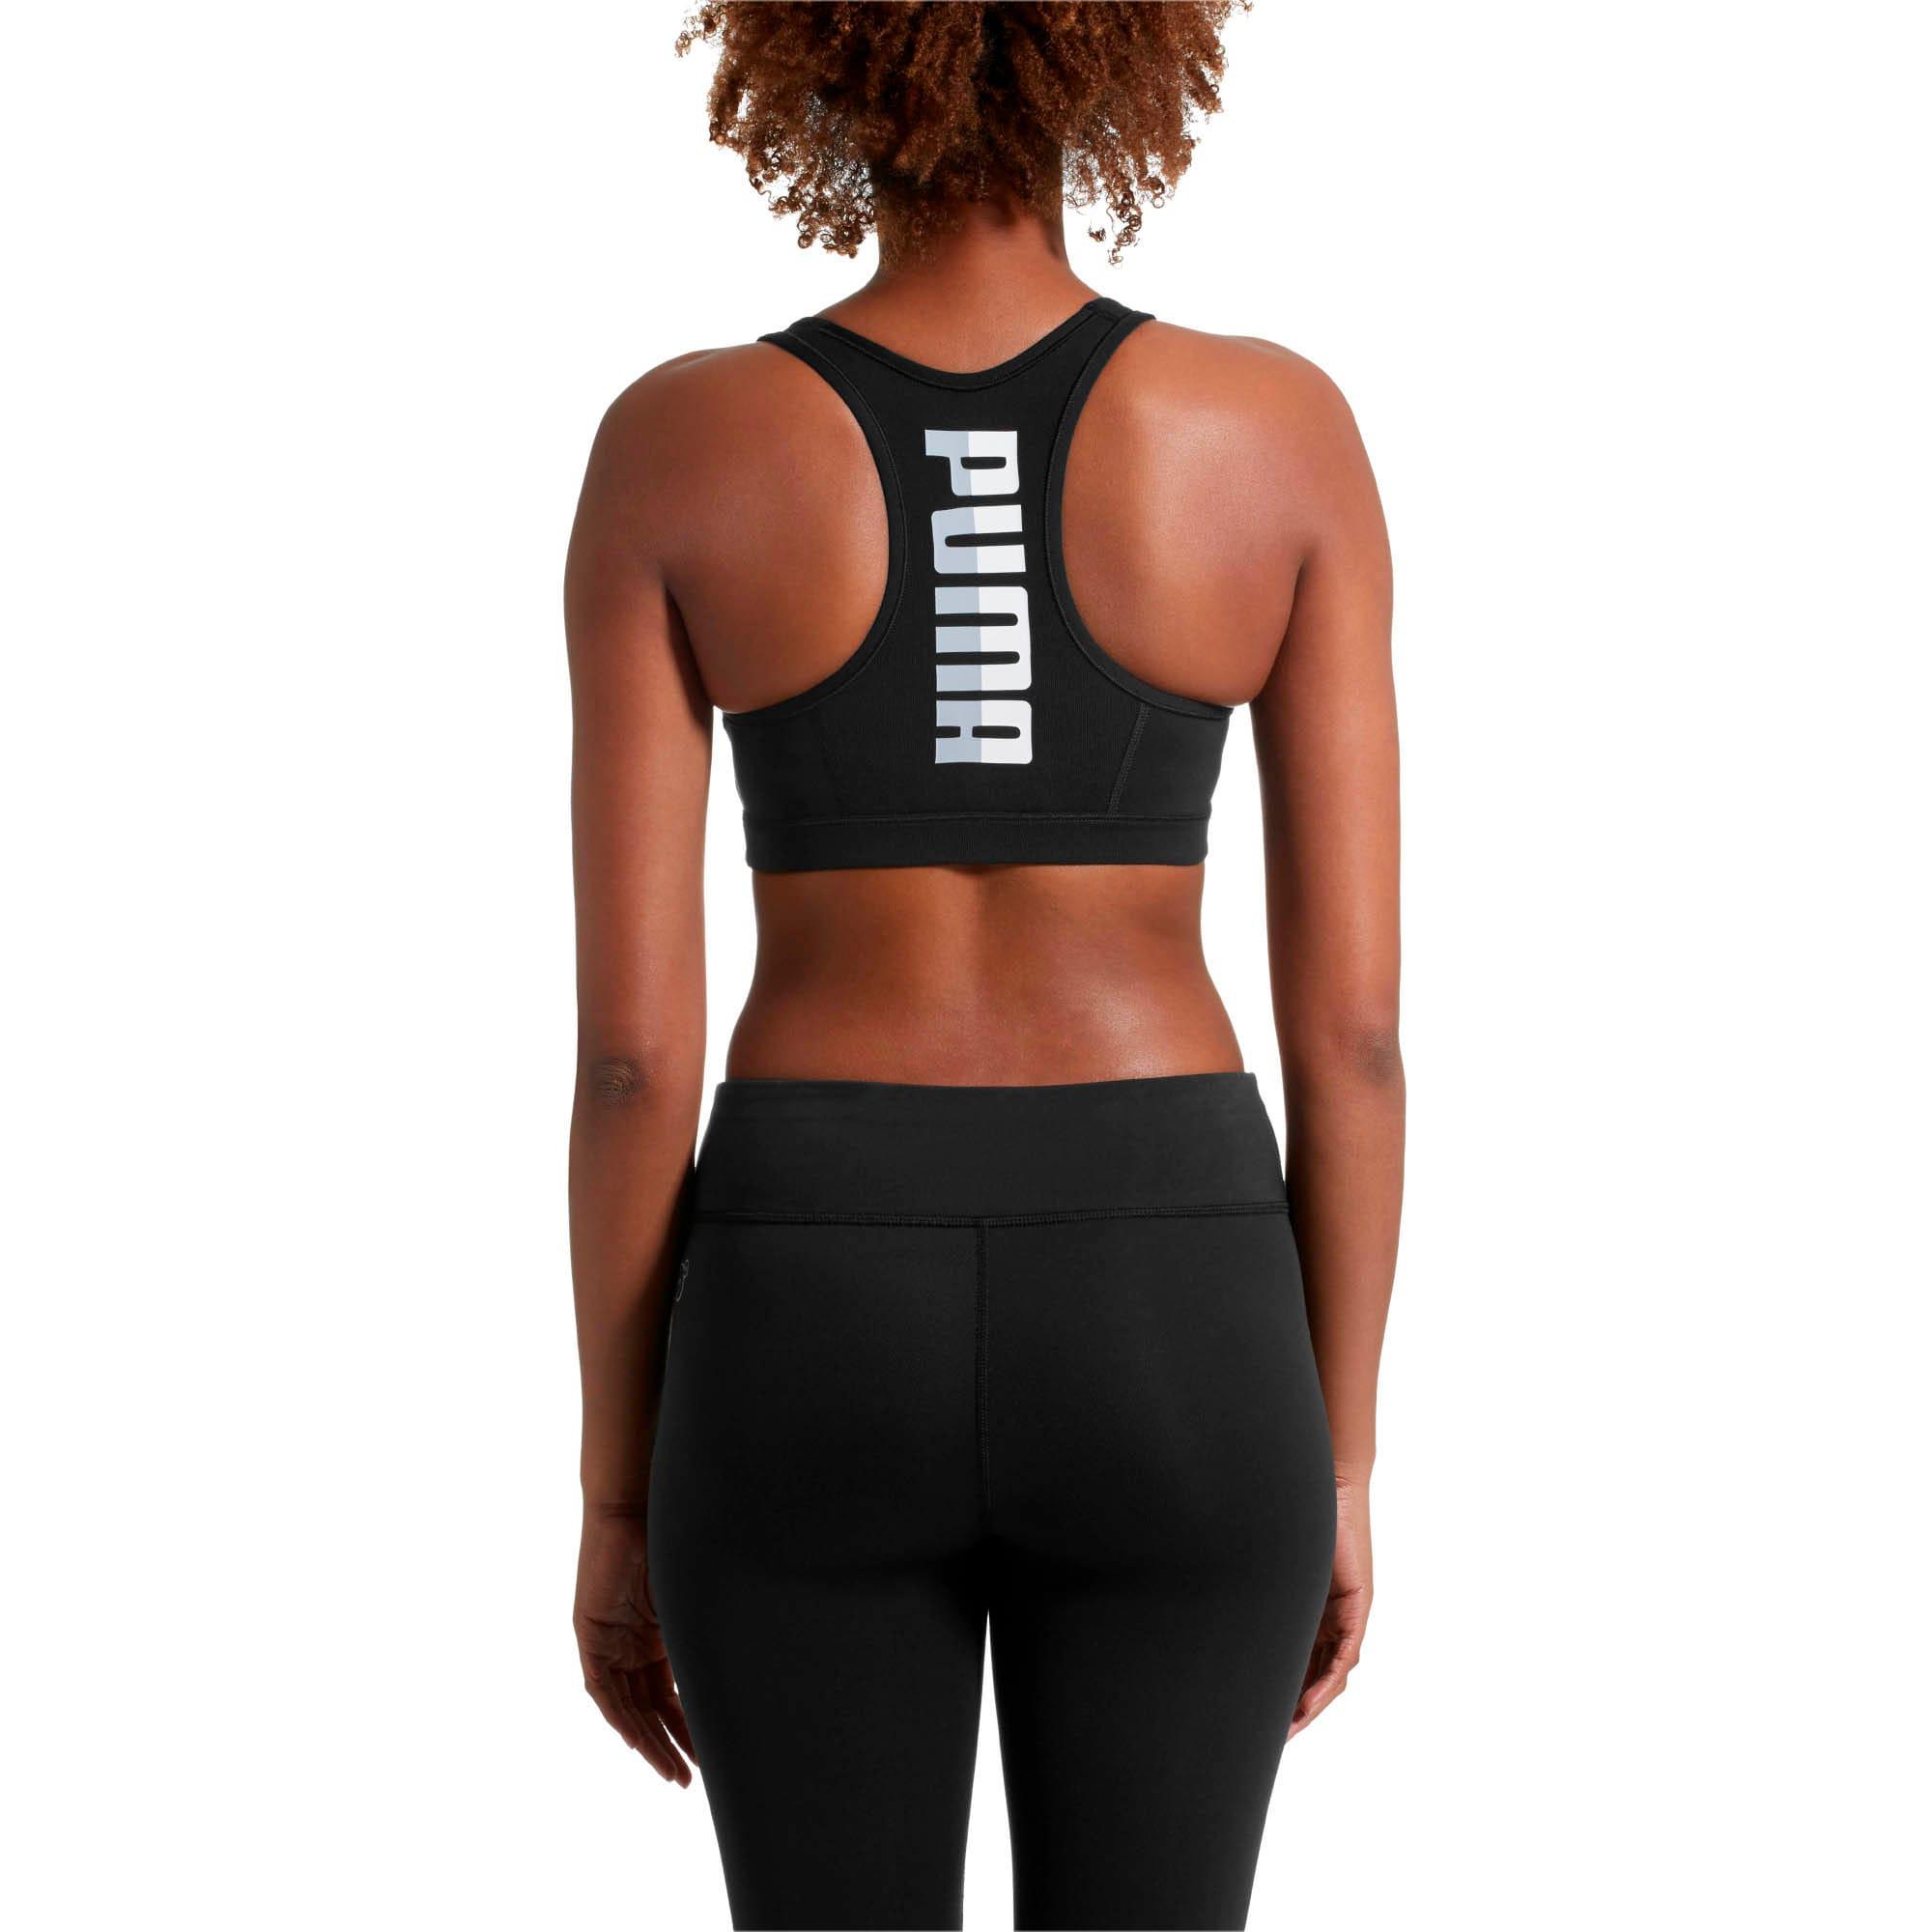 Thumbnail 2 of 4Keeps Women's Mid Impact Bra, Puma Black-white PUMA back, medium